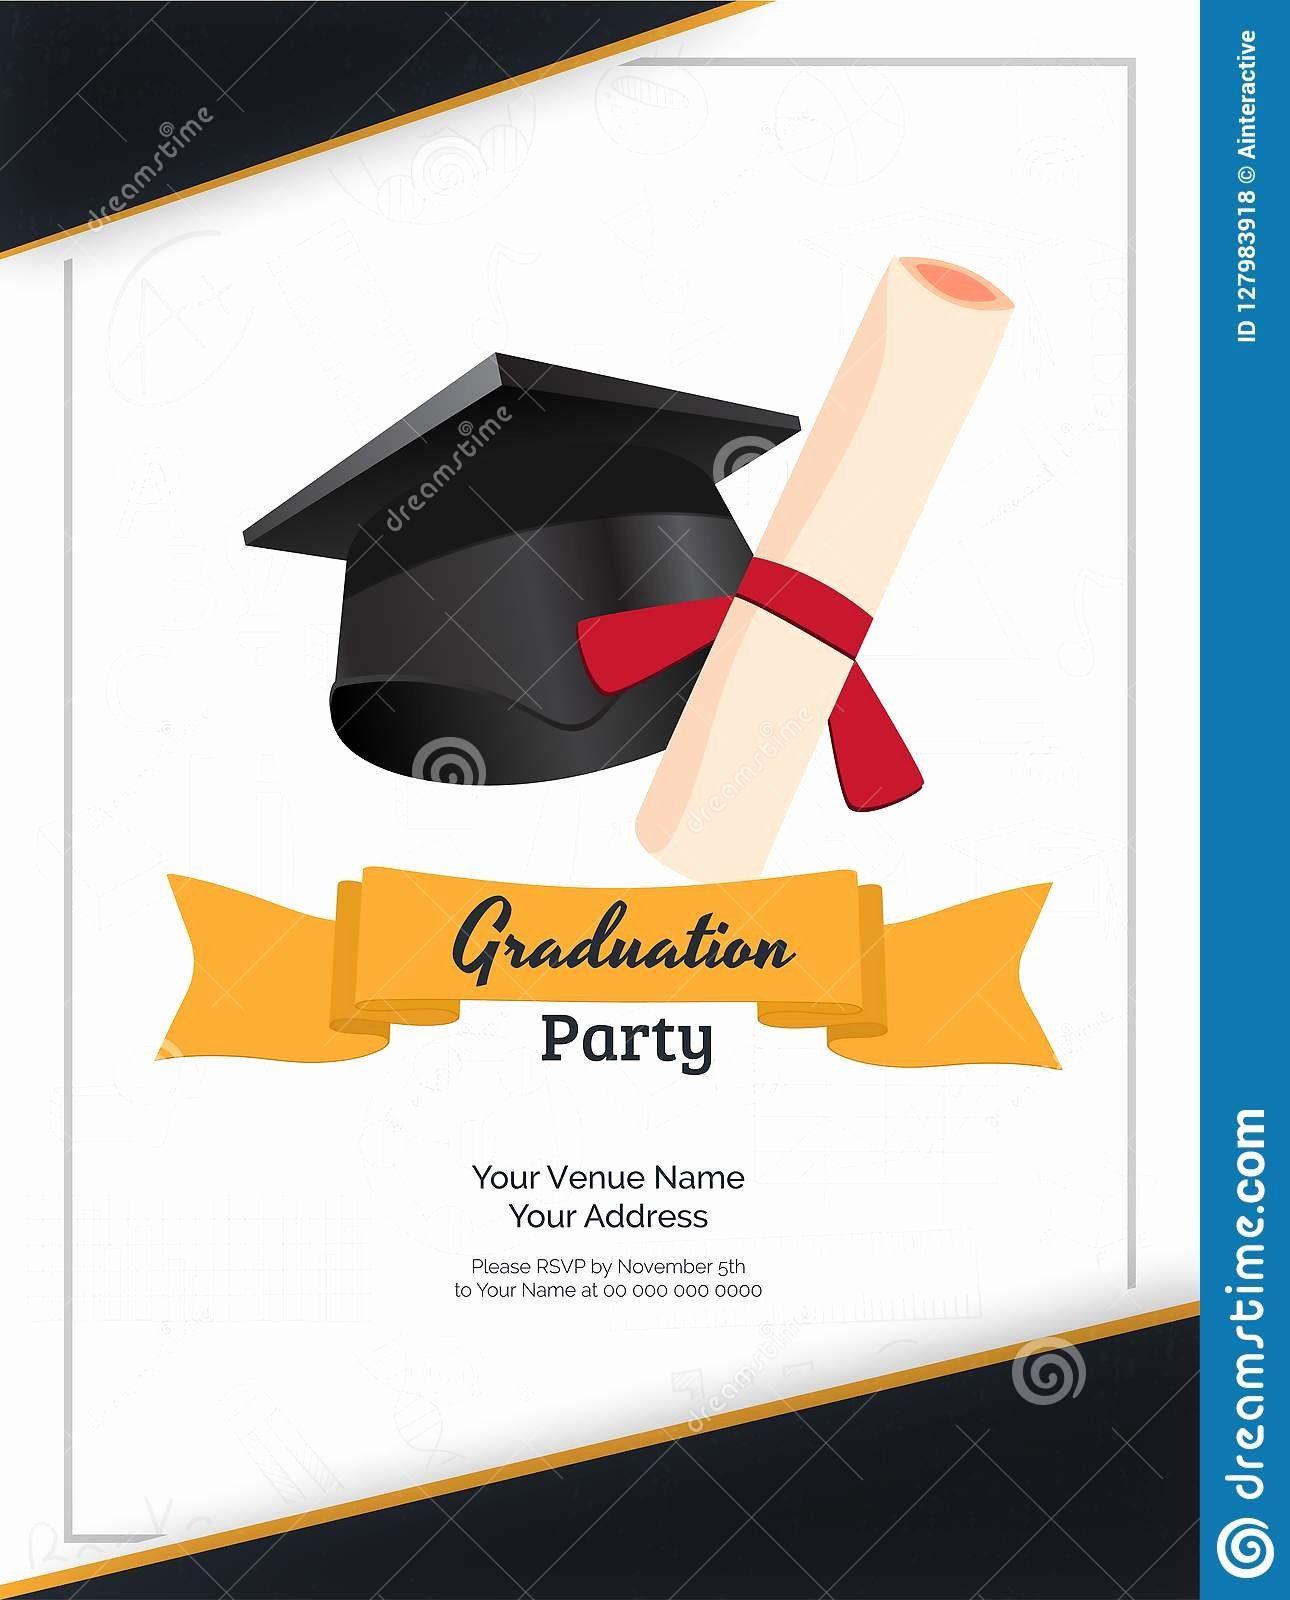 Graduation Invitation Templates Free Download New Graduation Party Invitati Graduation Invitations Template Graduation Invitations Graduation Party Invitations